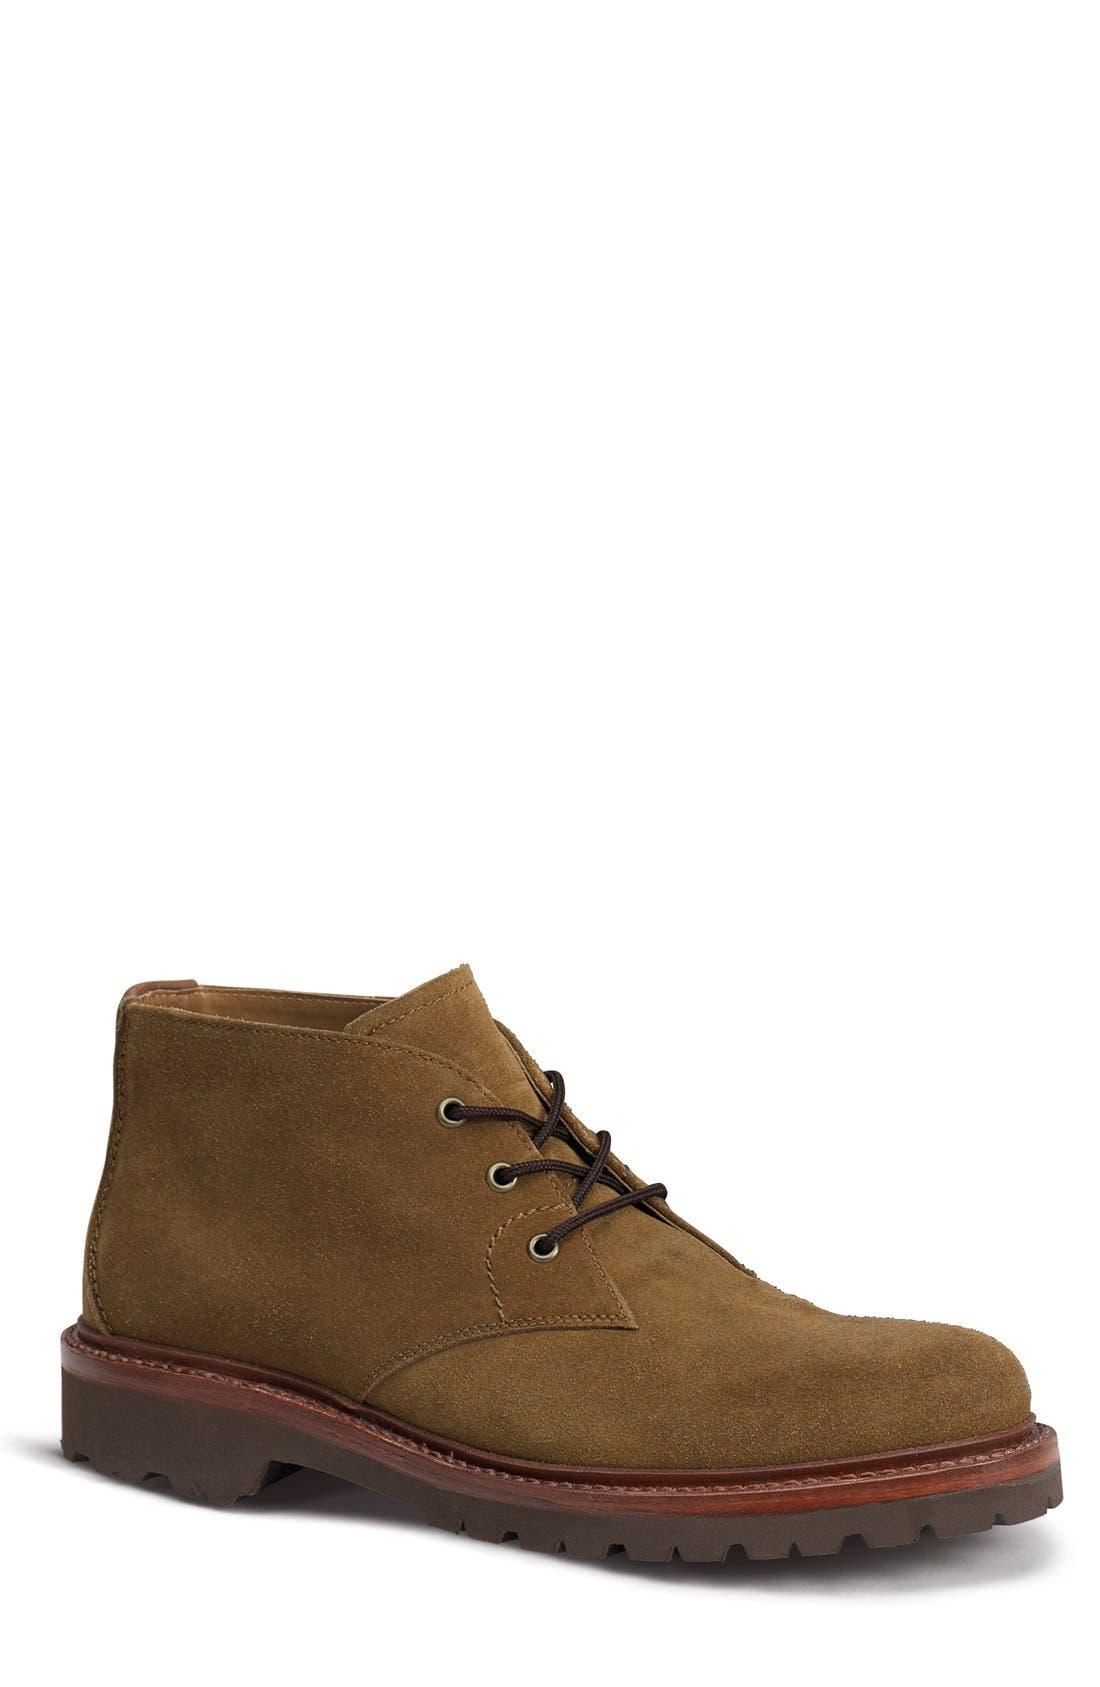 'Gulch II' Chukka Boot,                             Main thumbnail 1, color,                             024